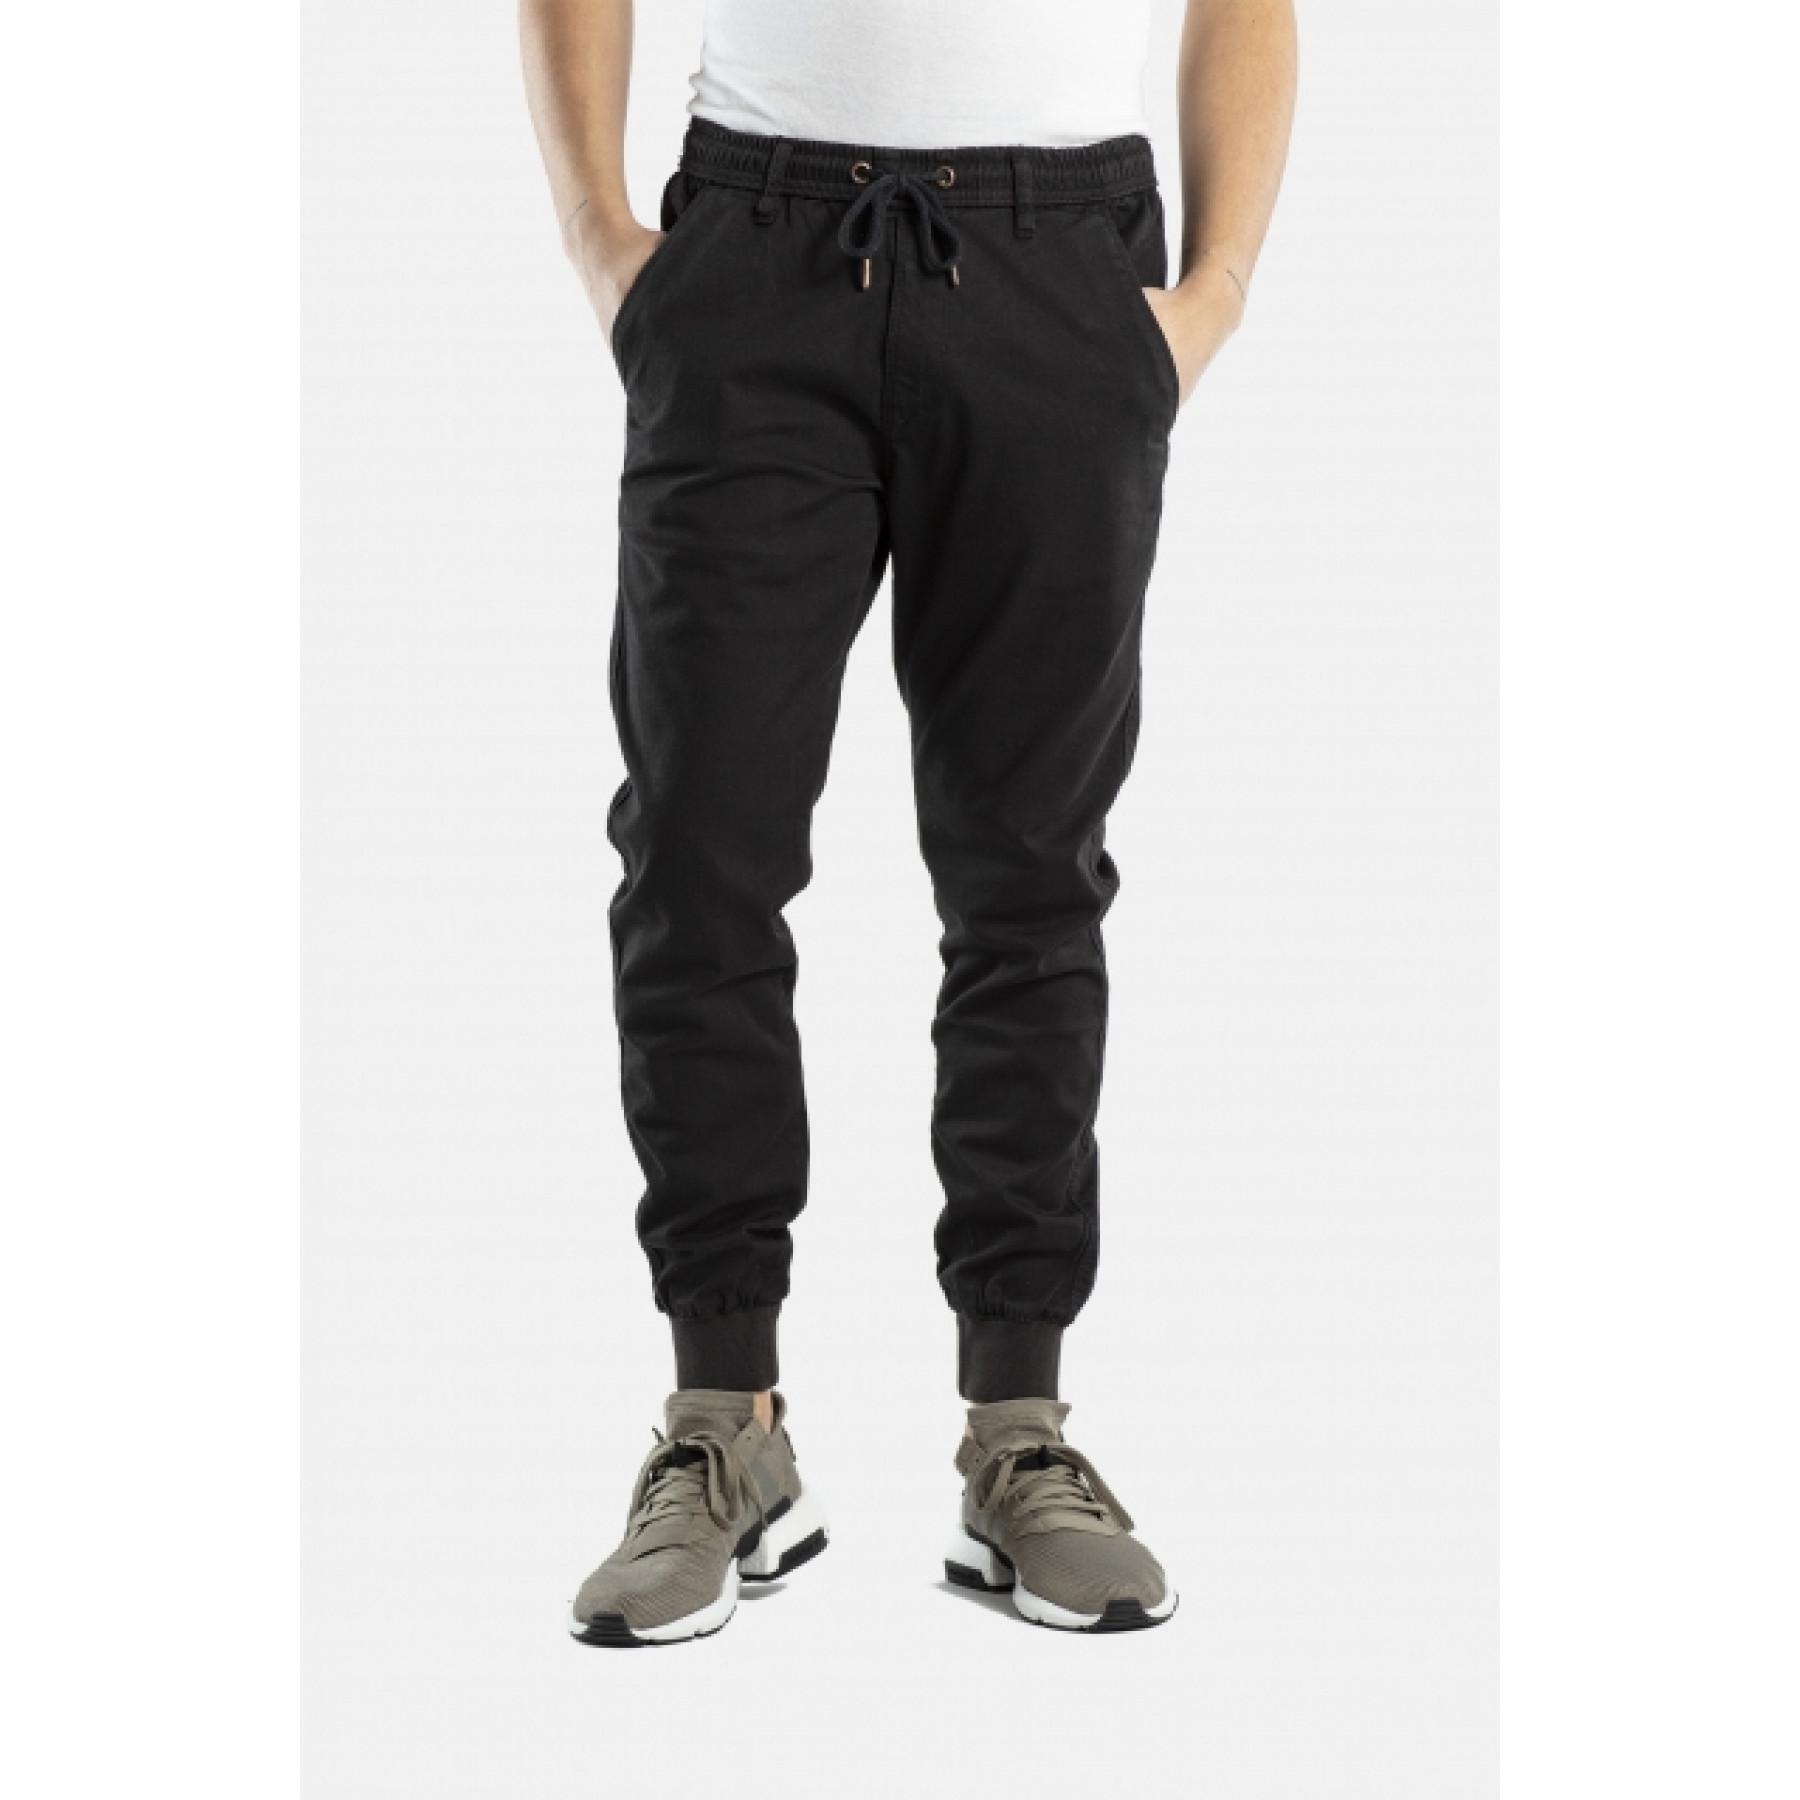 Pantalon Reell Reflex Rib